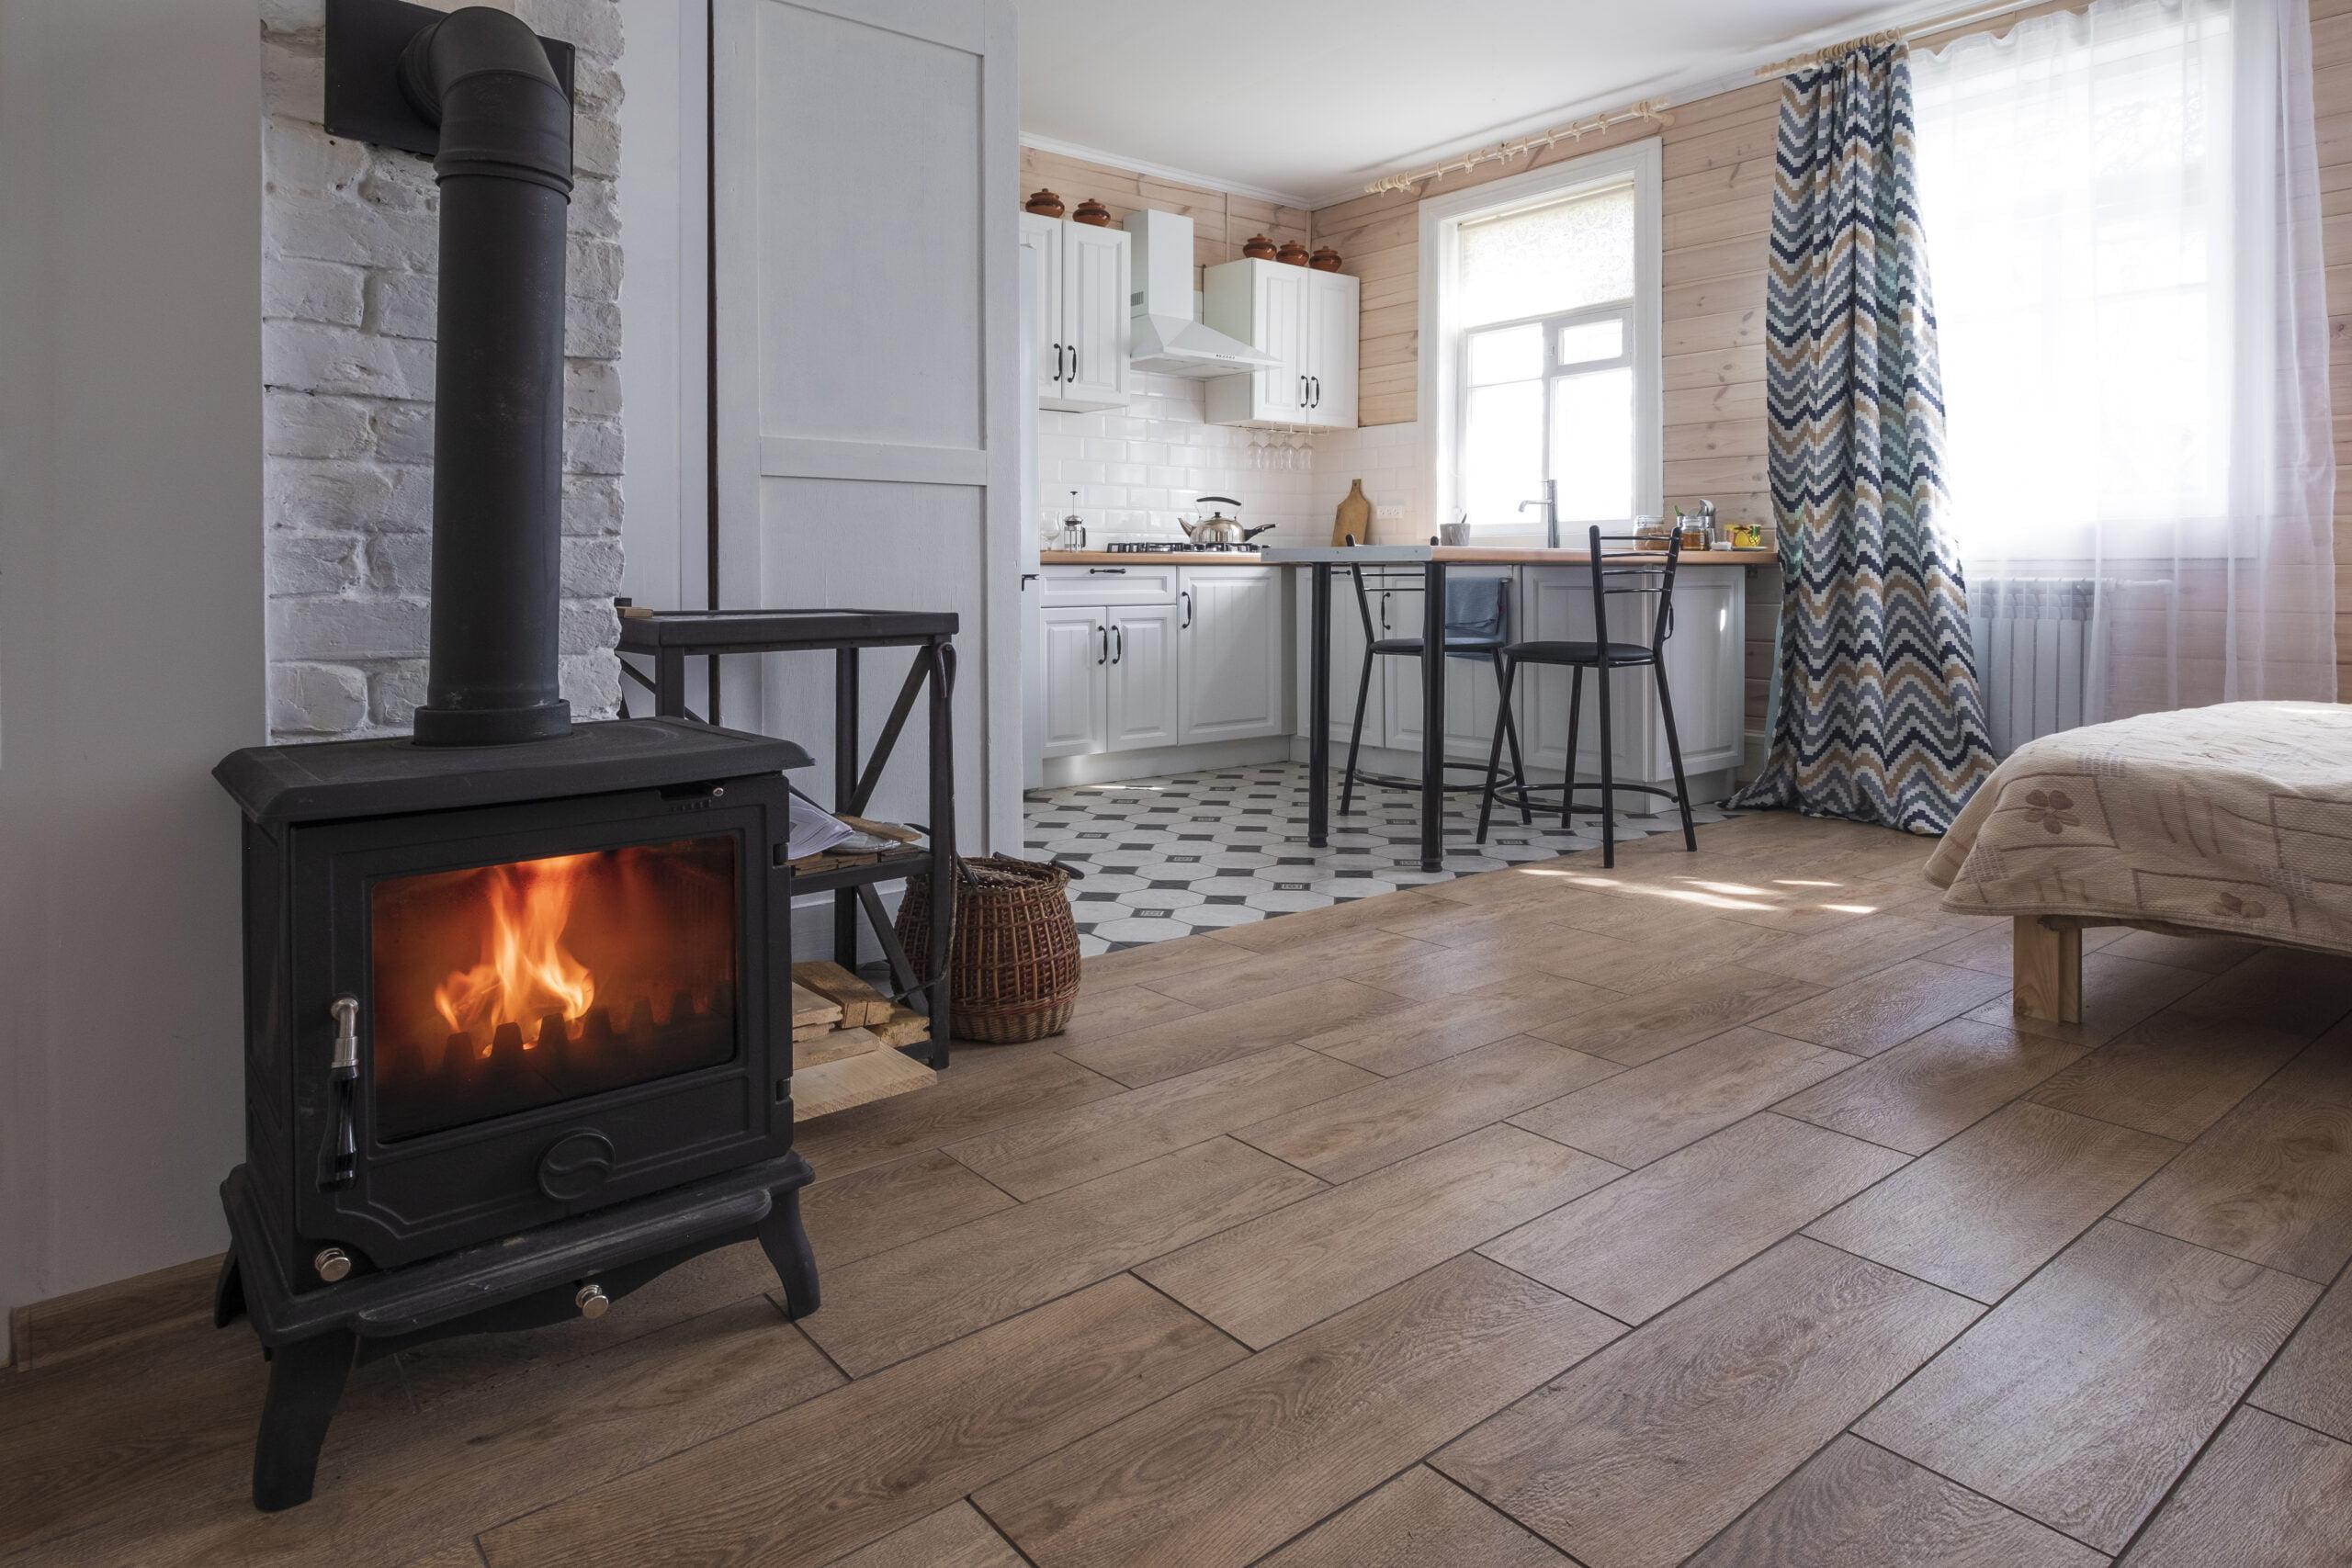 interior-bright-studio-room-with-fireplace